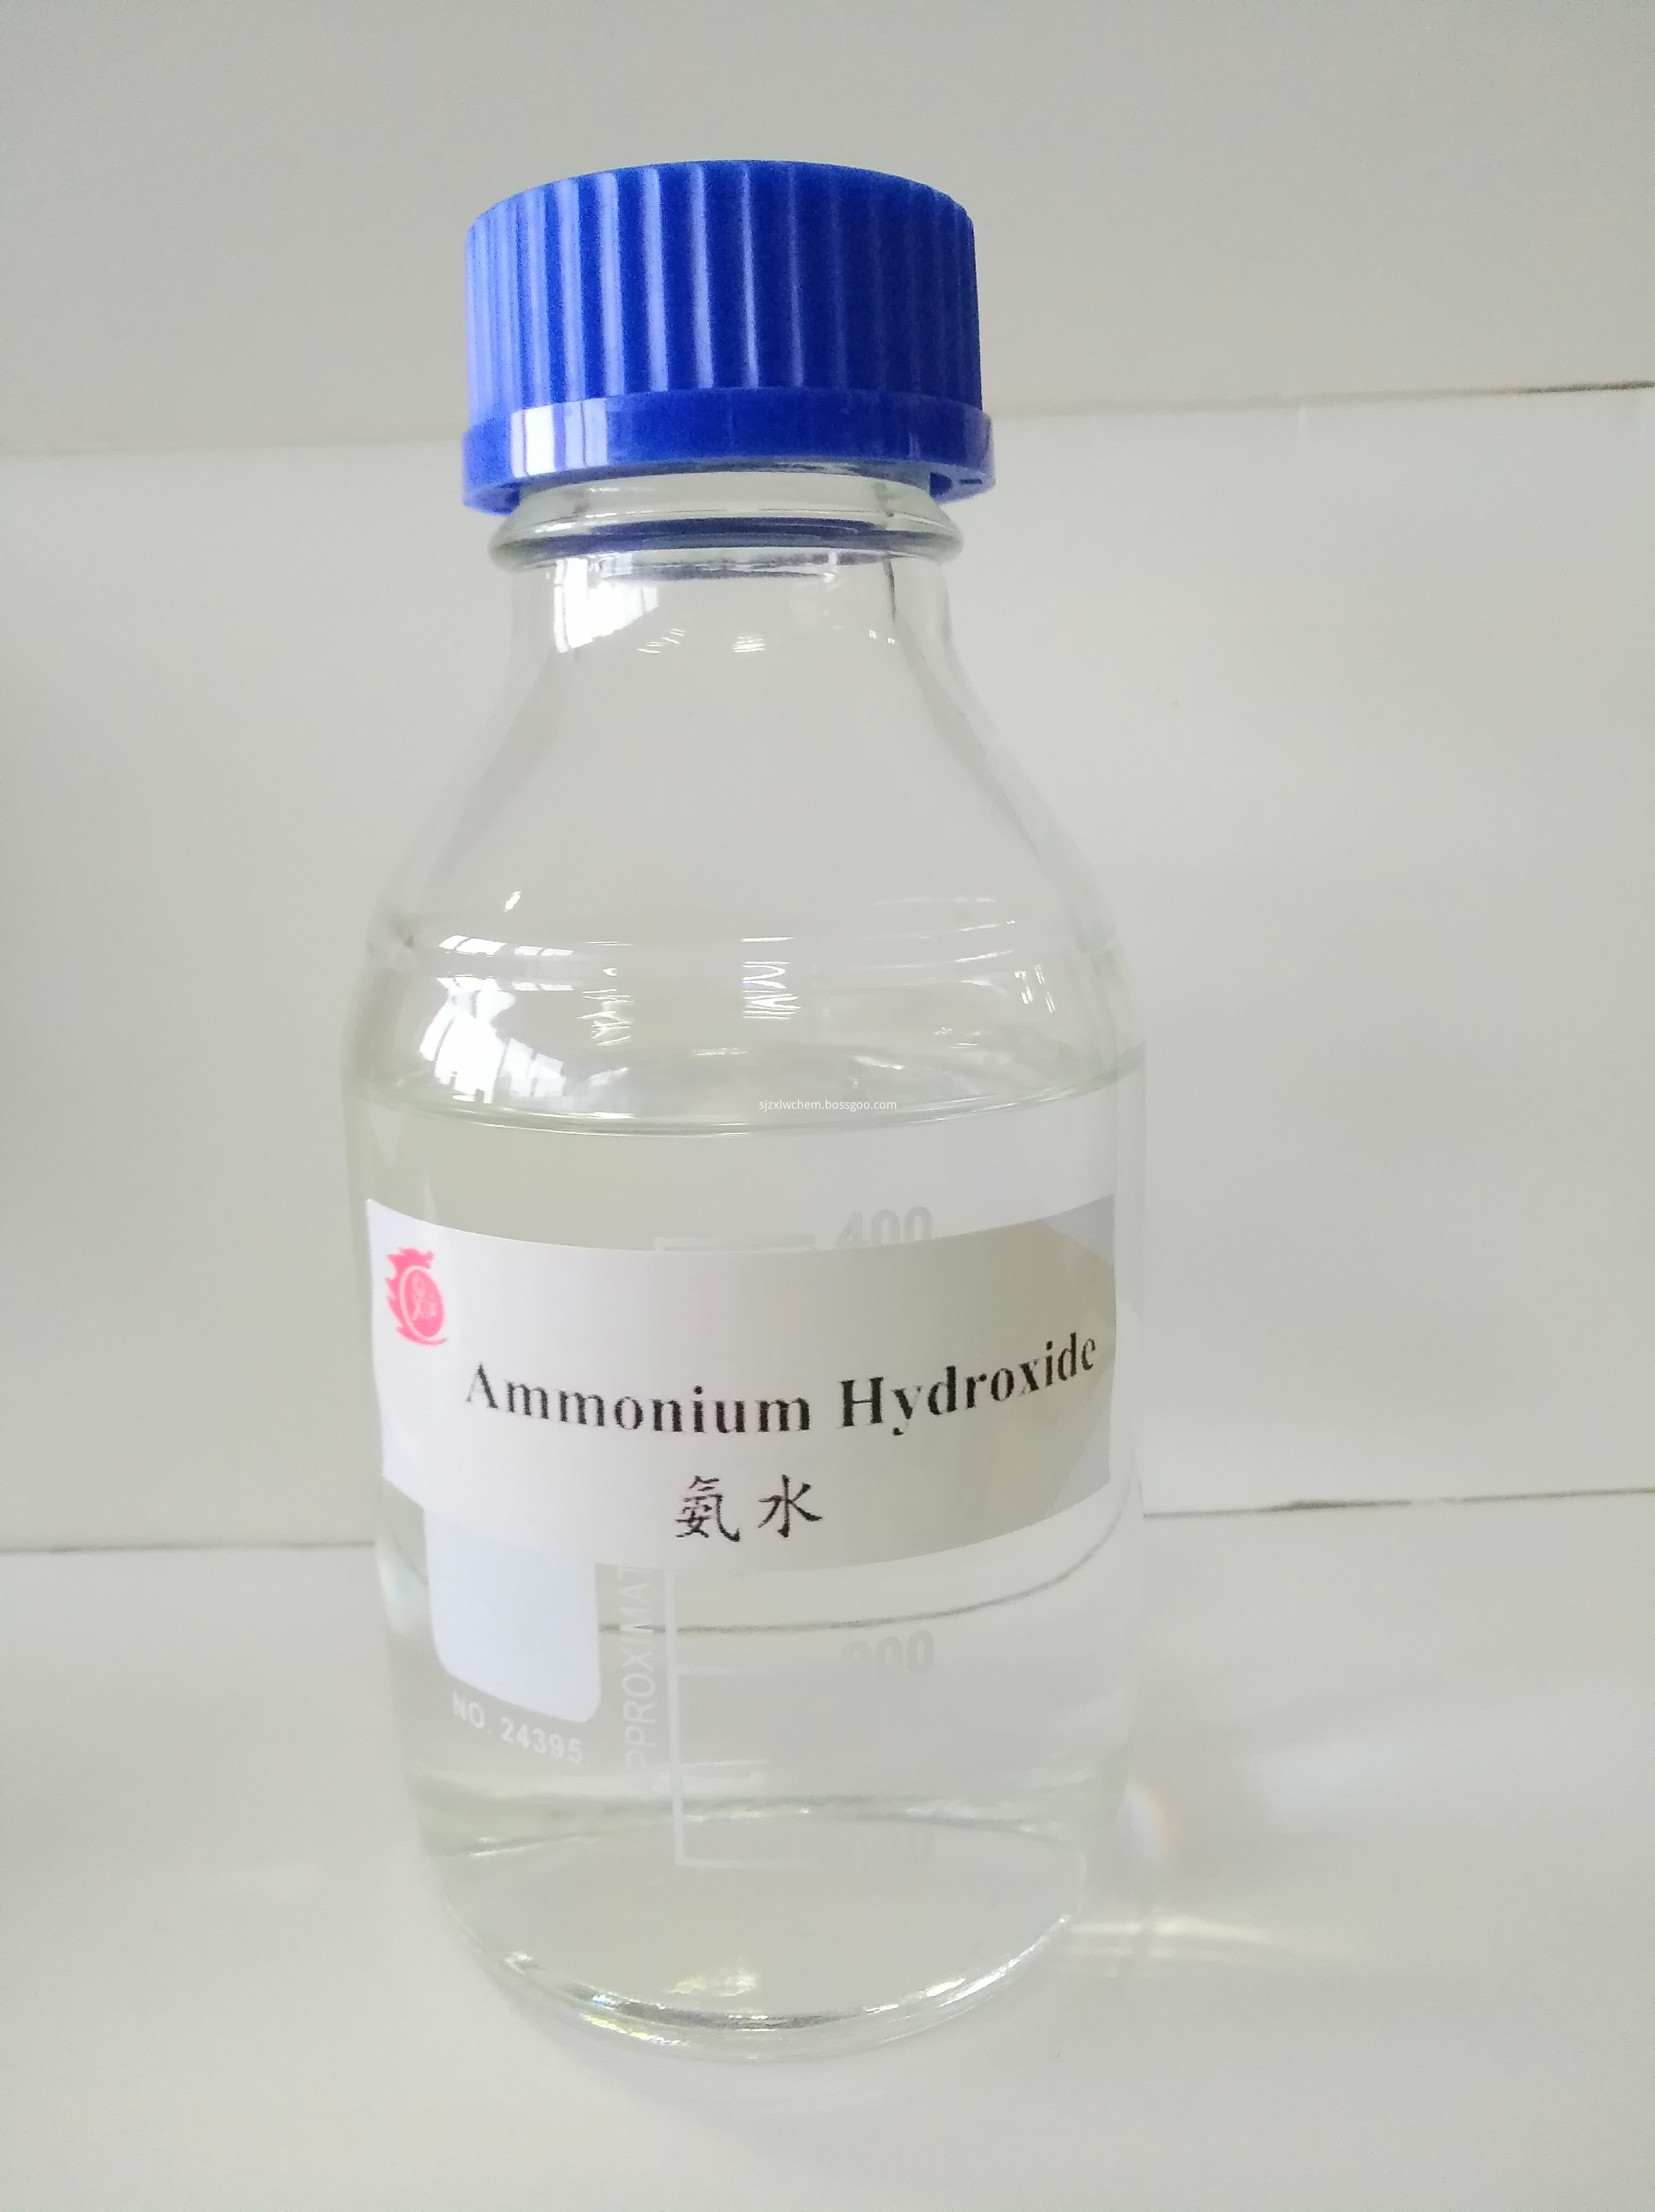 Ammonium Hydroxide Use For Paint